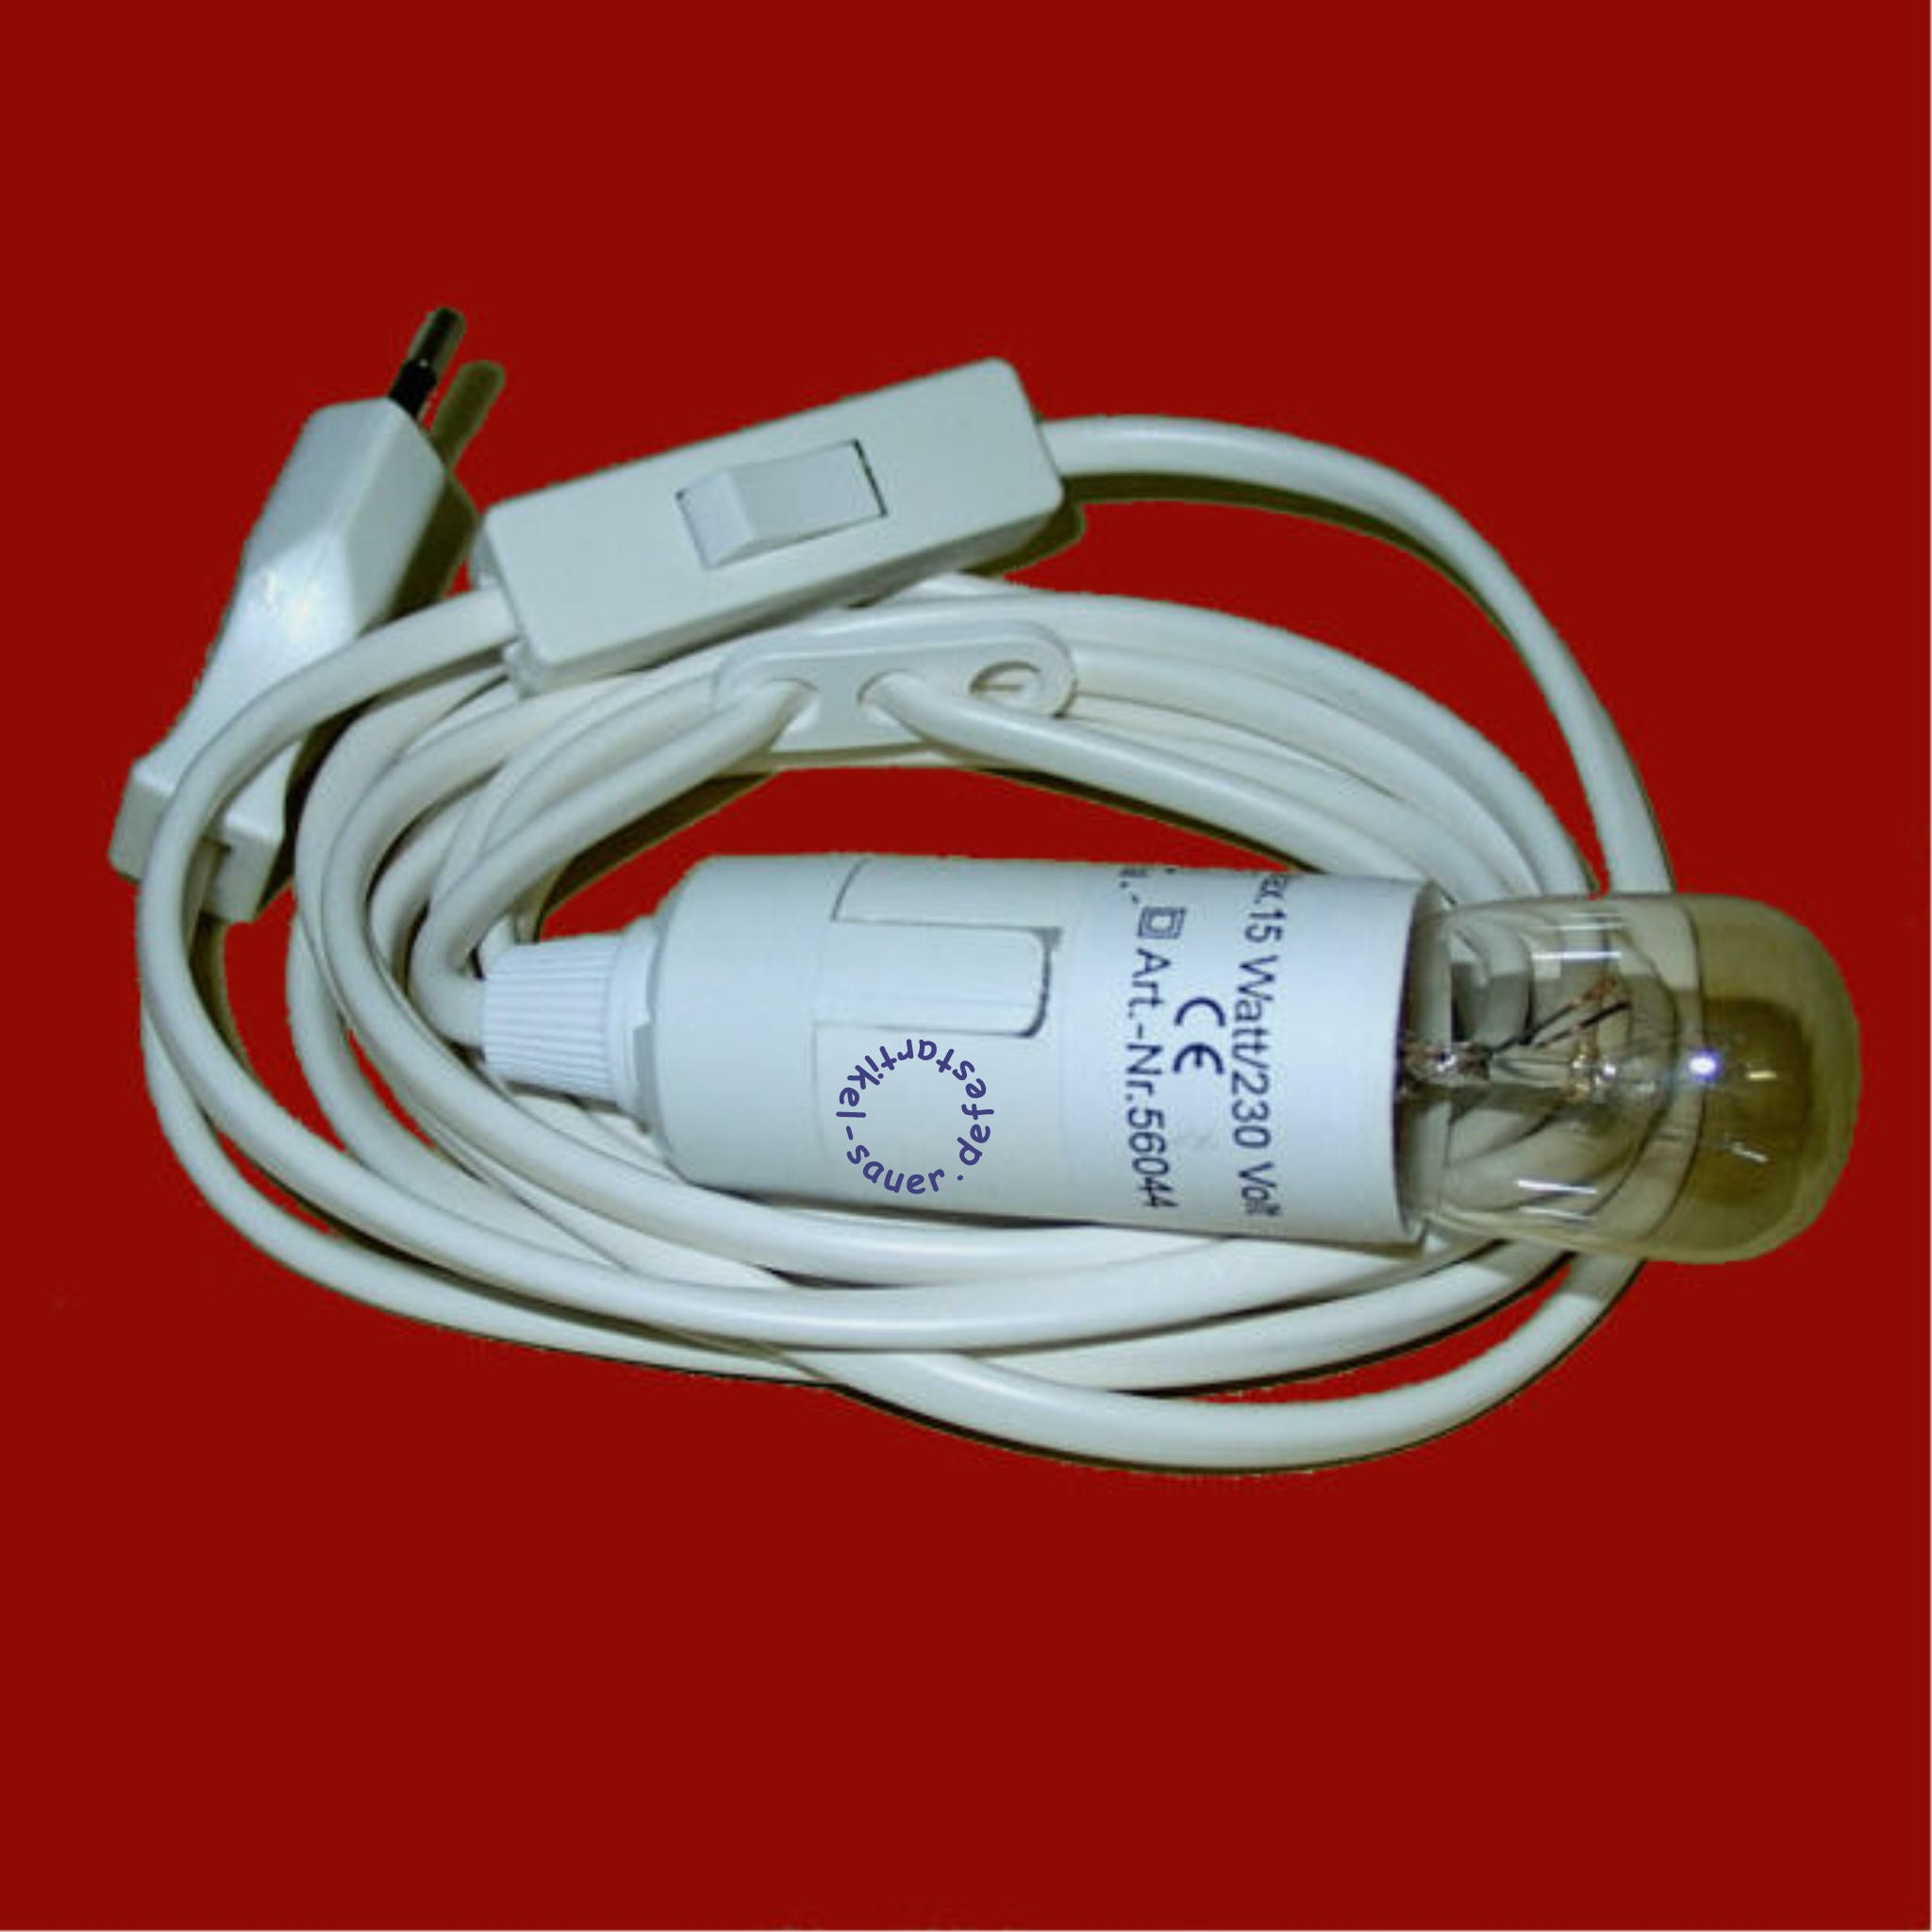 Beleuchtungsset Kabel 3m + Schalter+15W-Lampe+Stecker VE12 ...